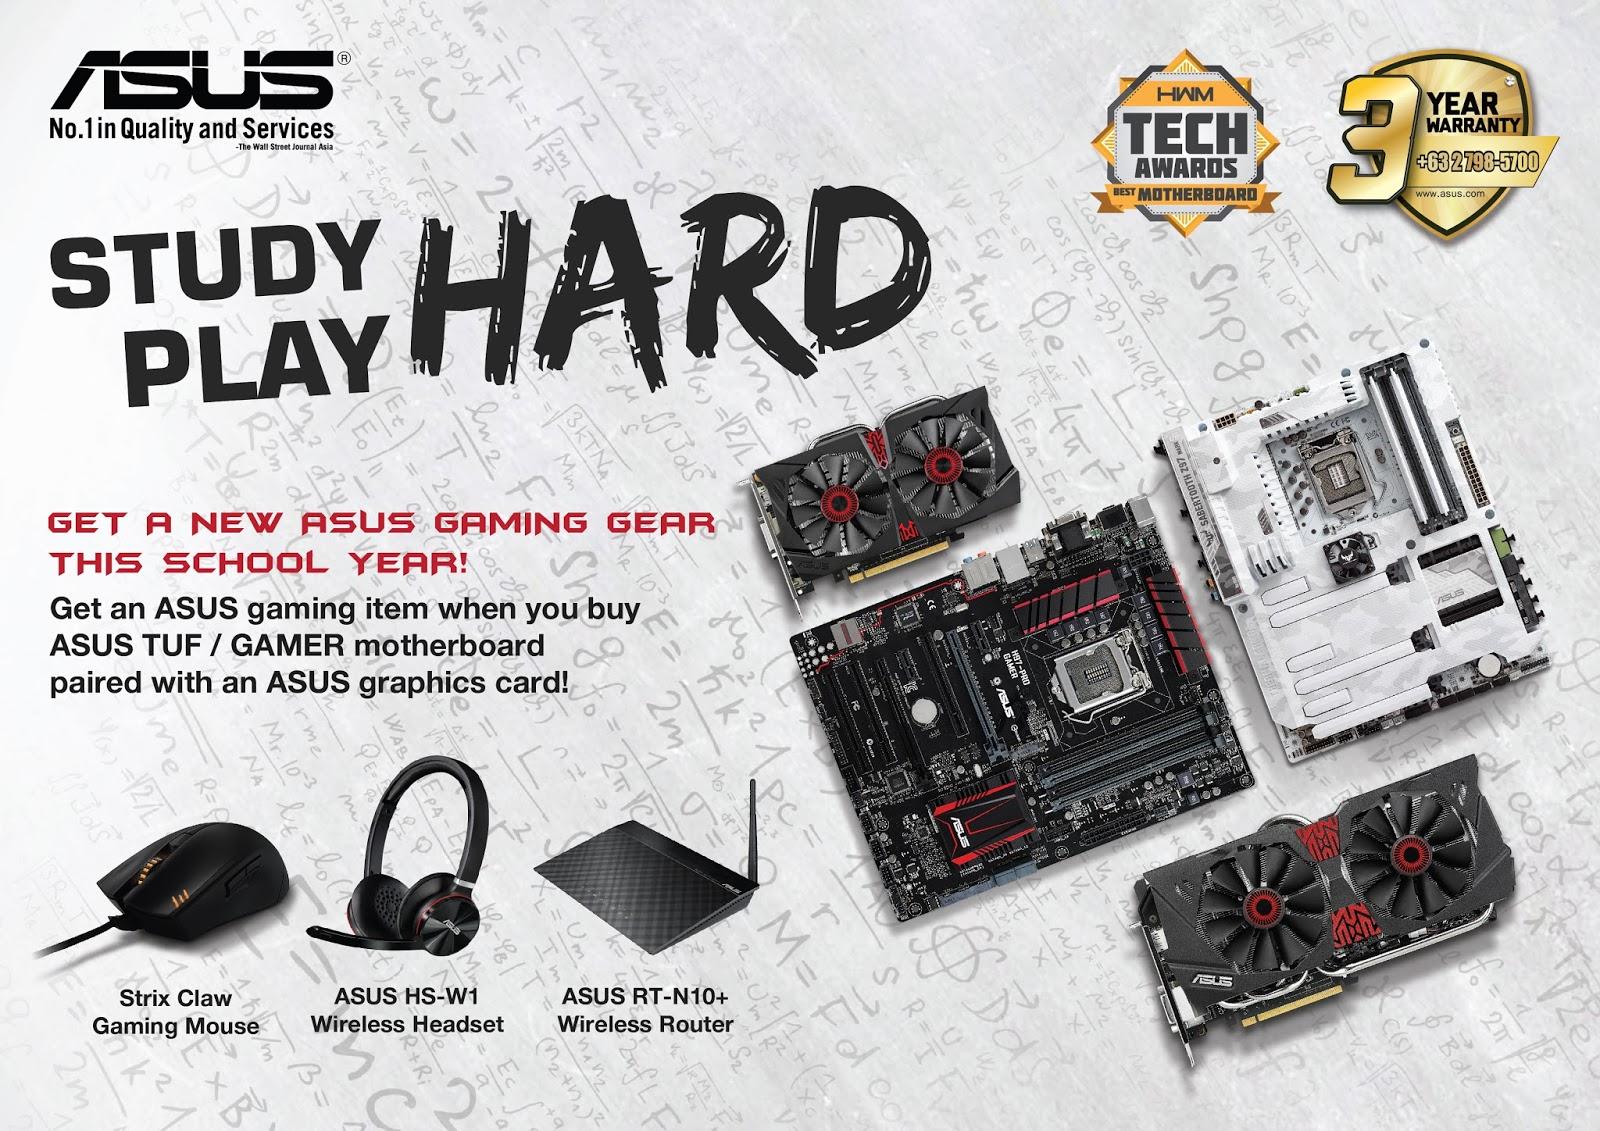 ASUS Study Hard, Play Hard Promo